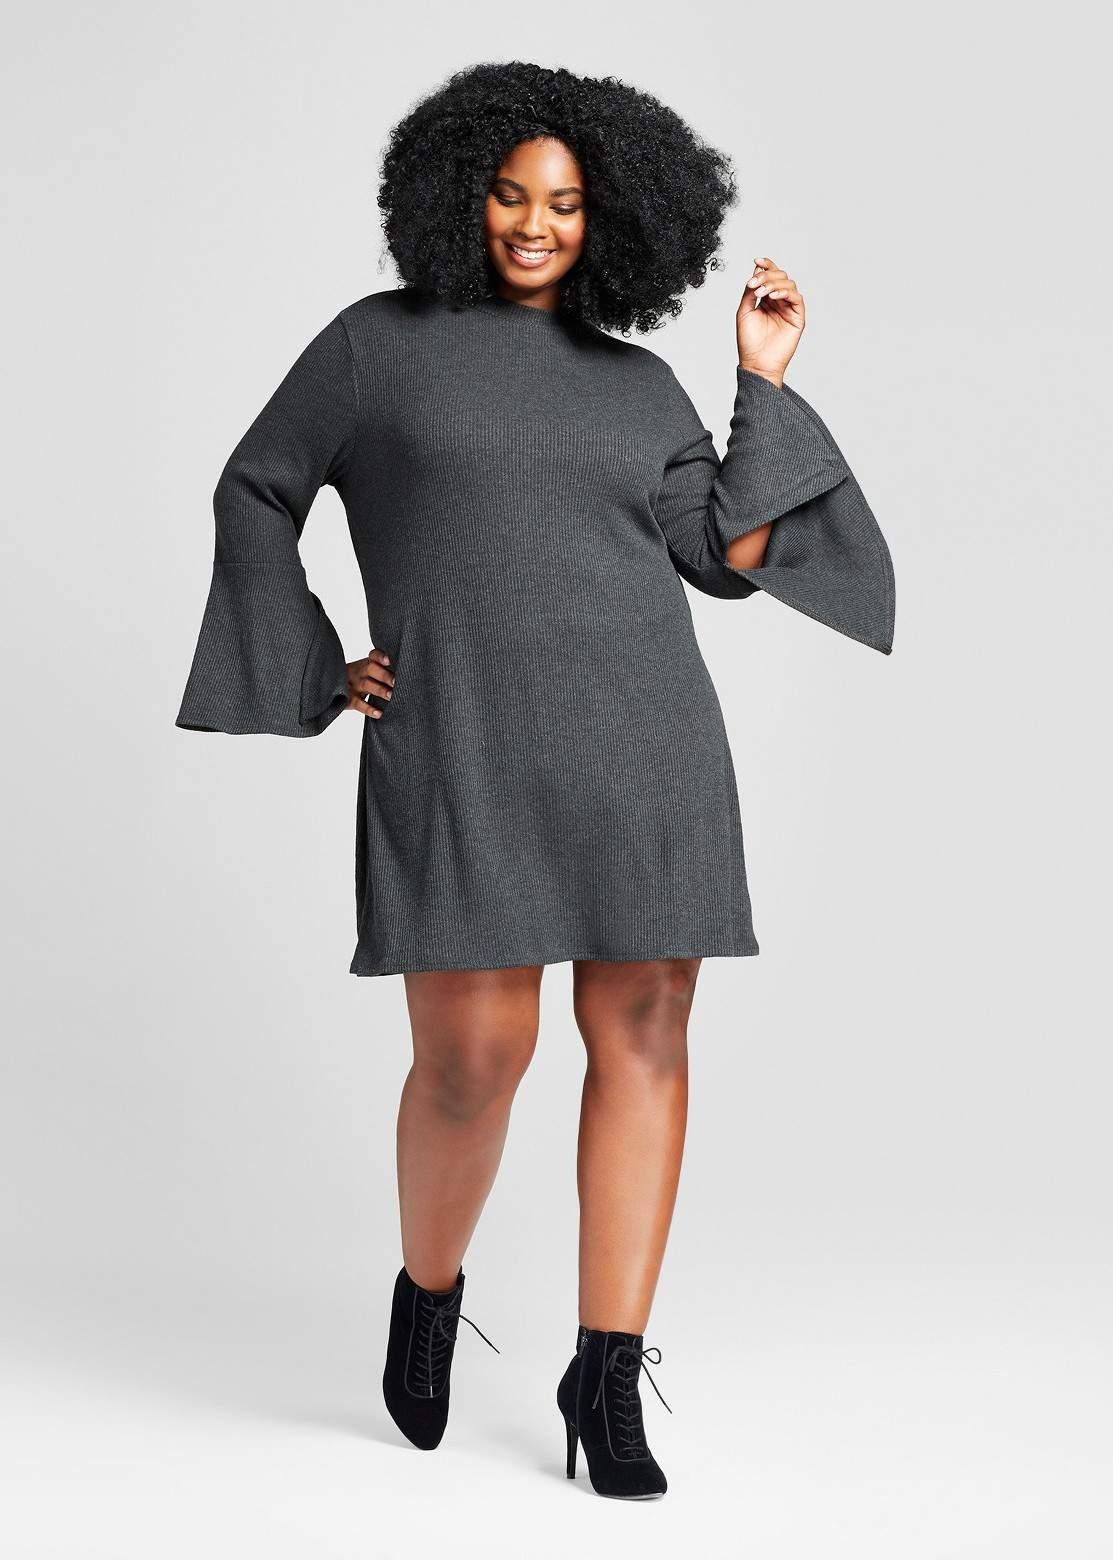 Cute Plus Size Clothes Near Me | ANLIS